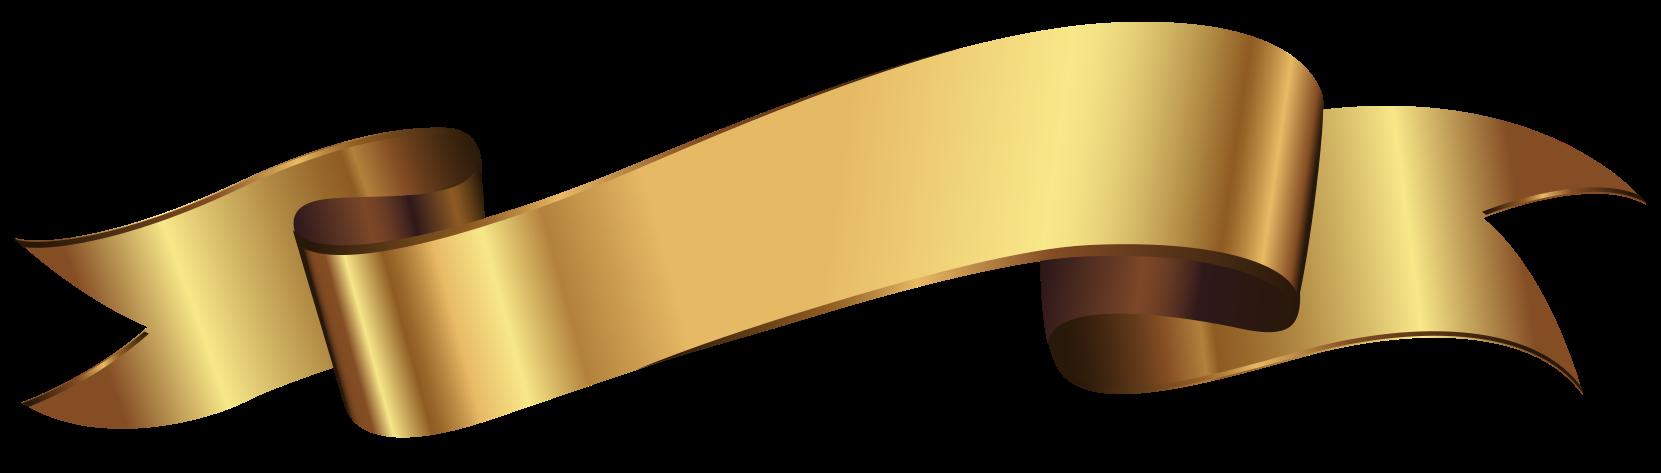 goldenes Band png